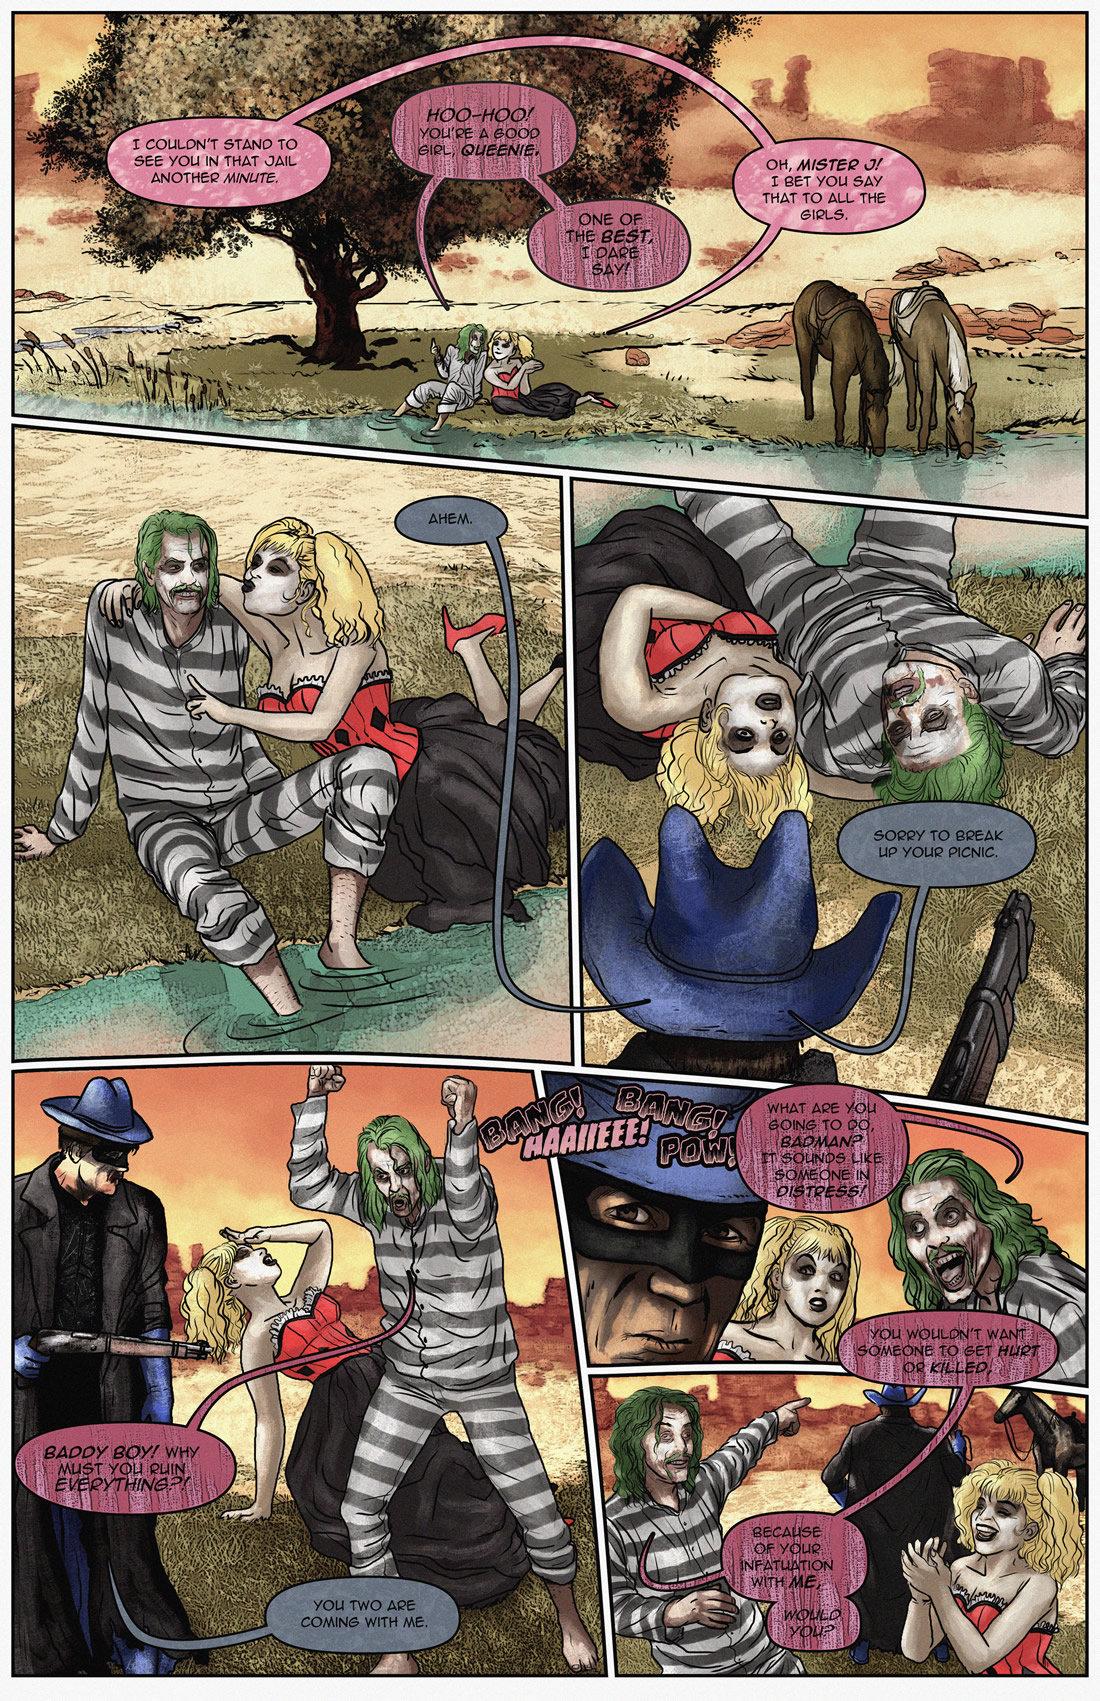 the badman 2 page 2.jpg